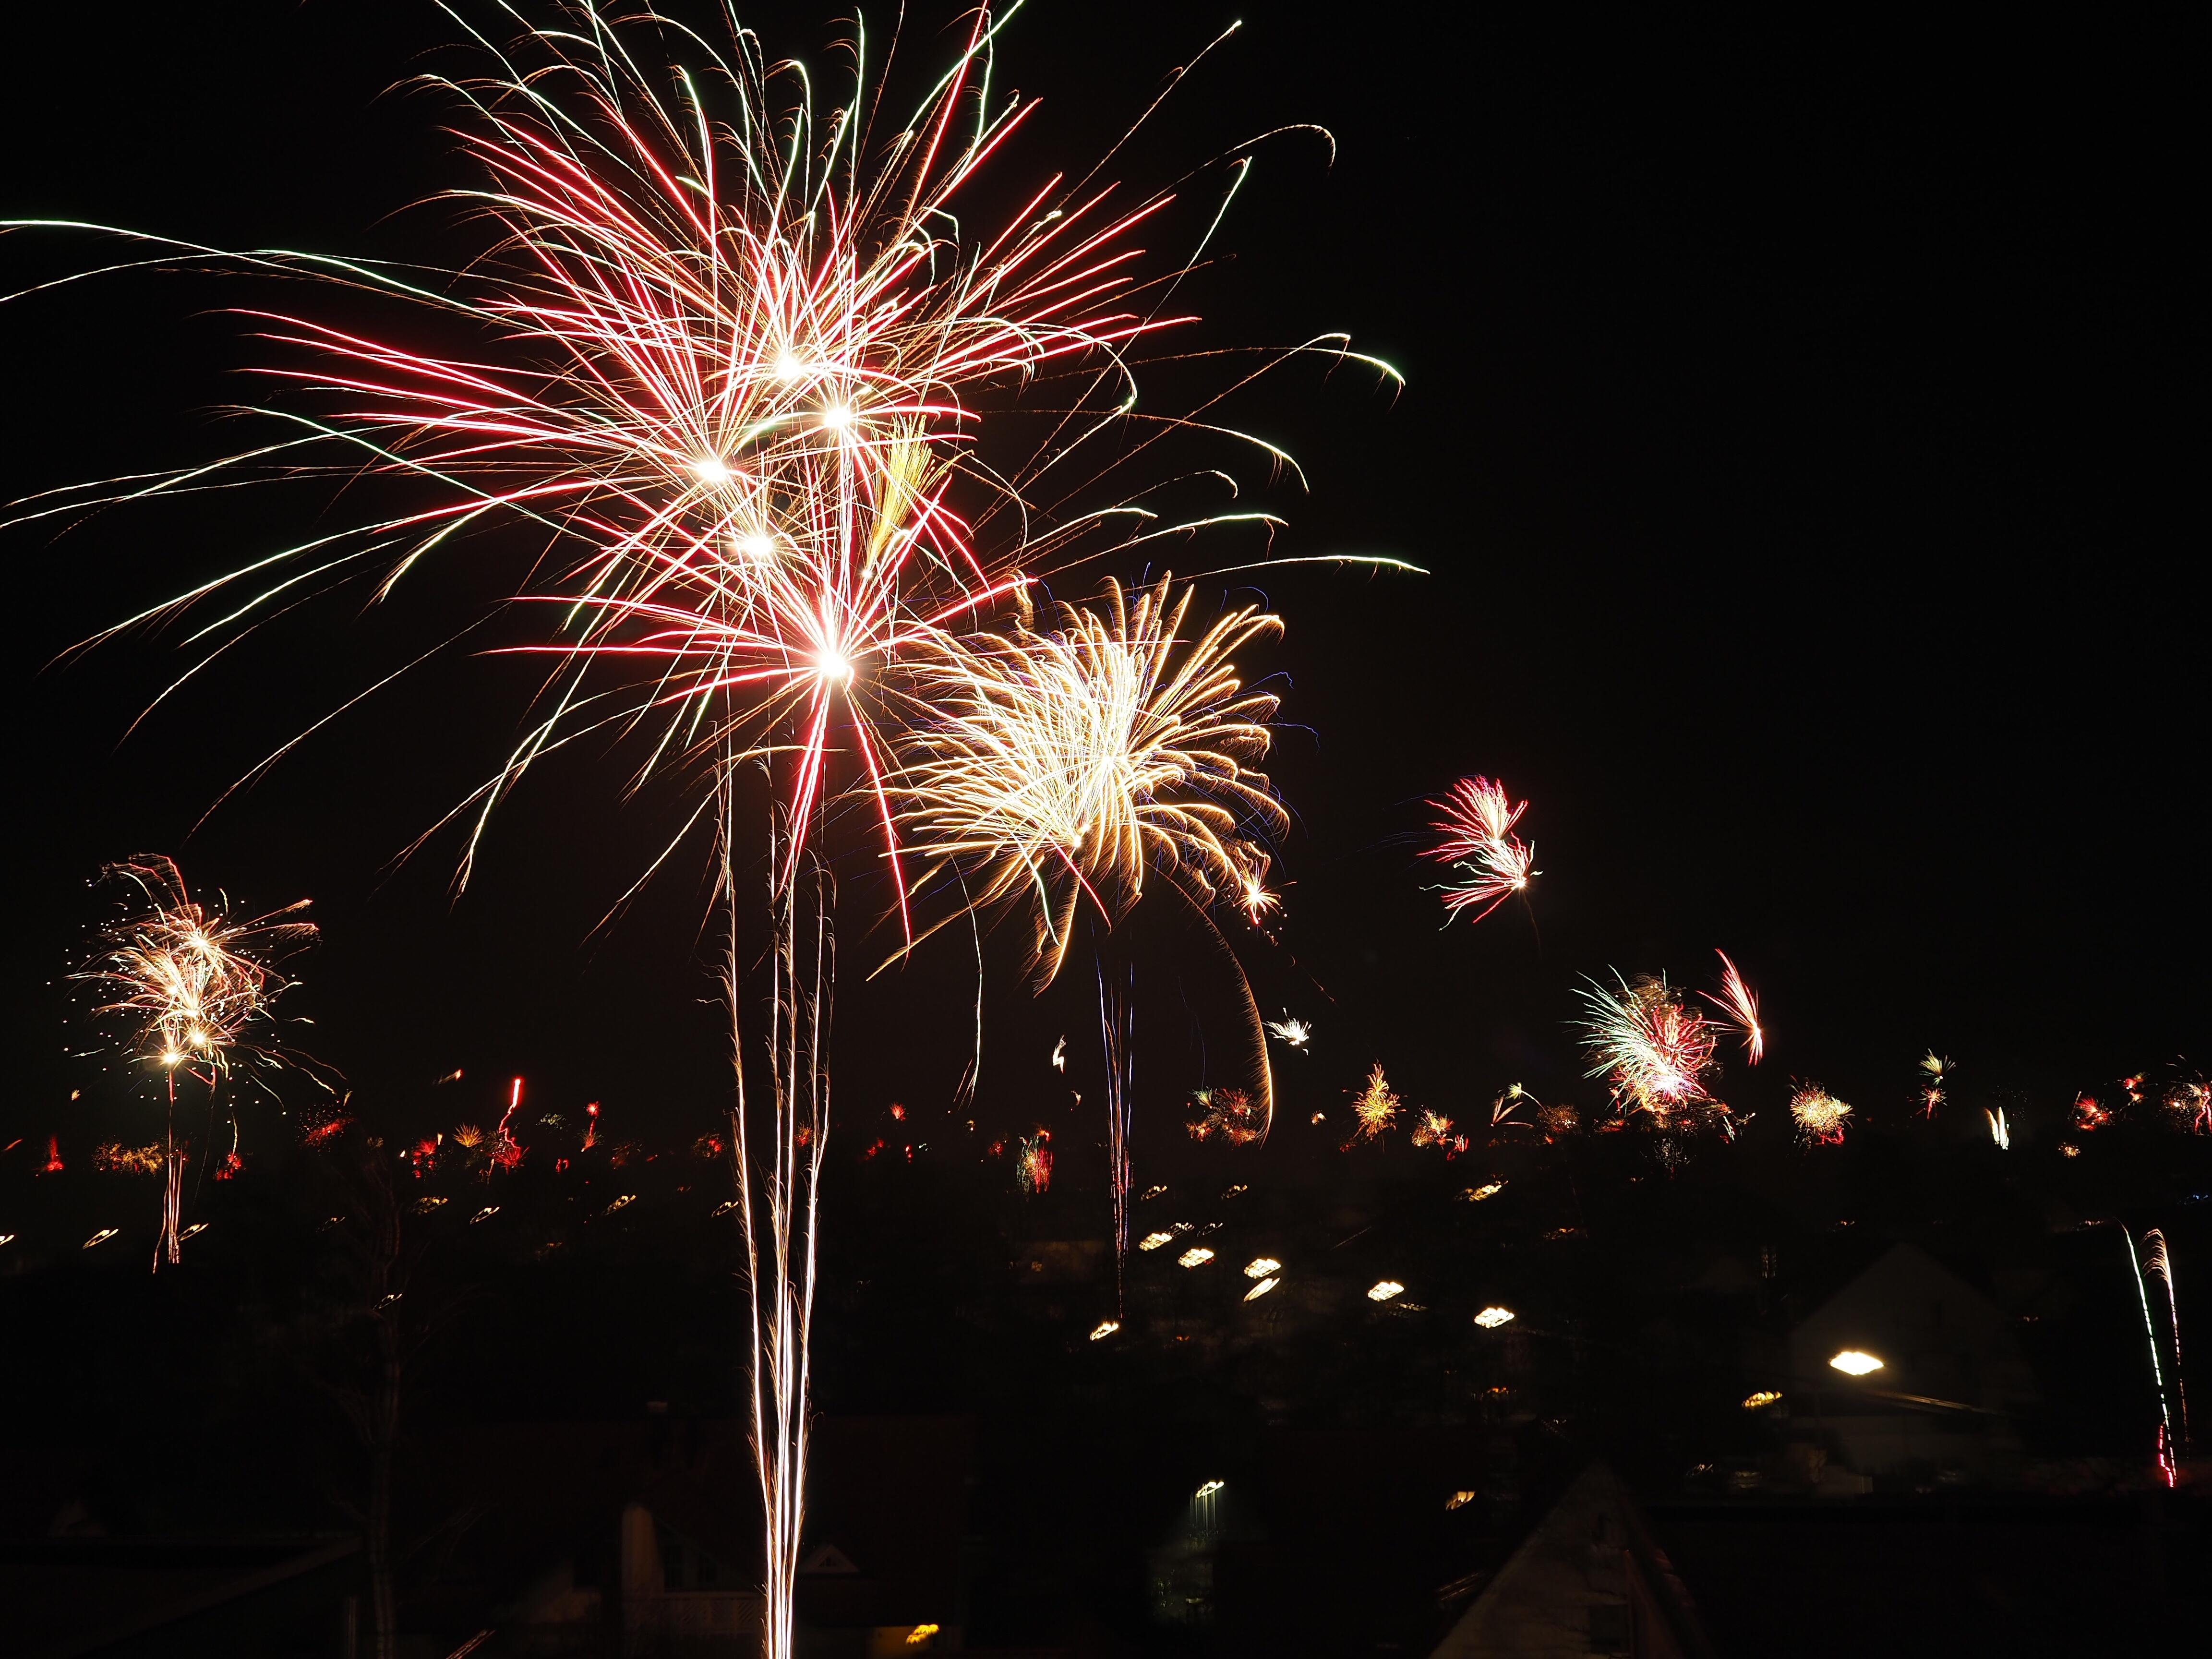 Shooting fireworks with the OM-D EM-5 mark II – Adrian Thomas